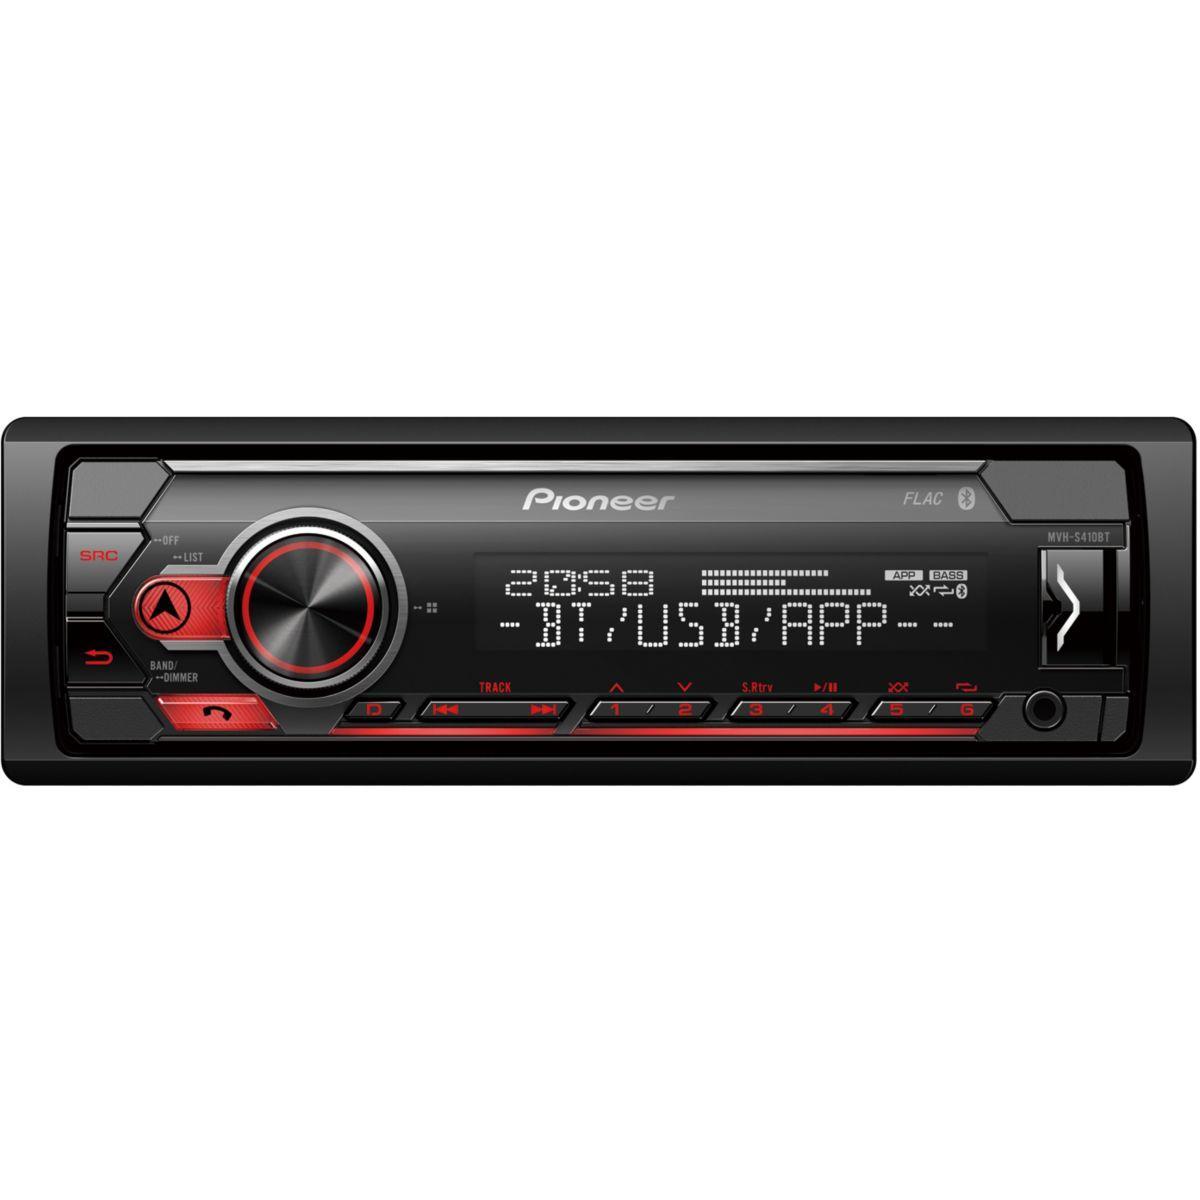 Auto-radio pioneer mvh-s410bt - usb ipod bluetooth - livraison offerte : code premium